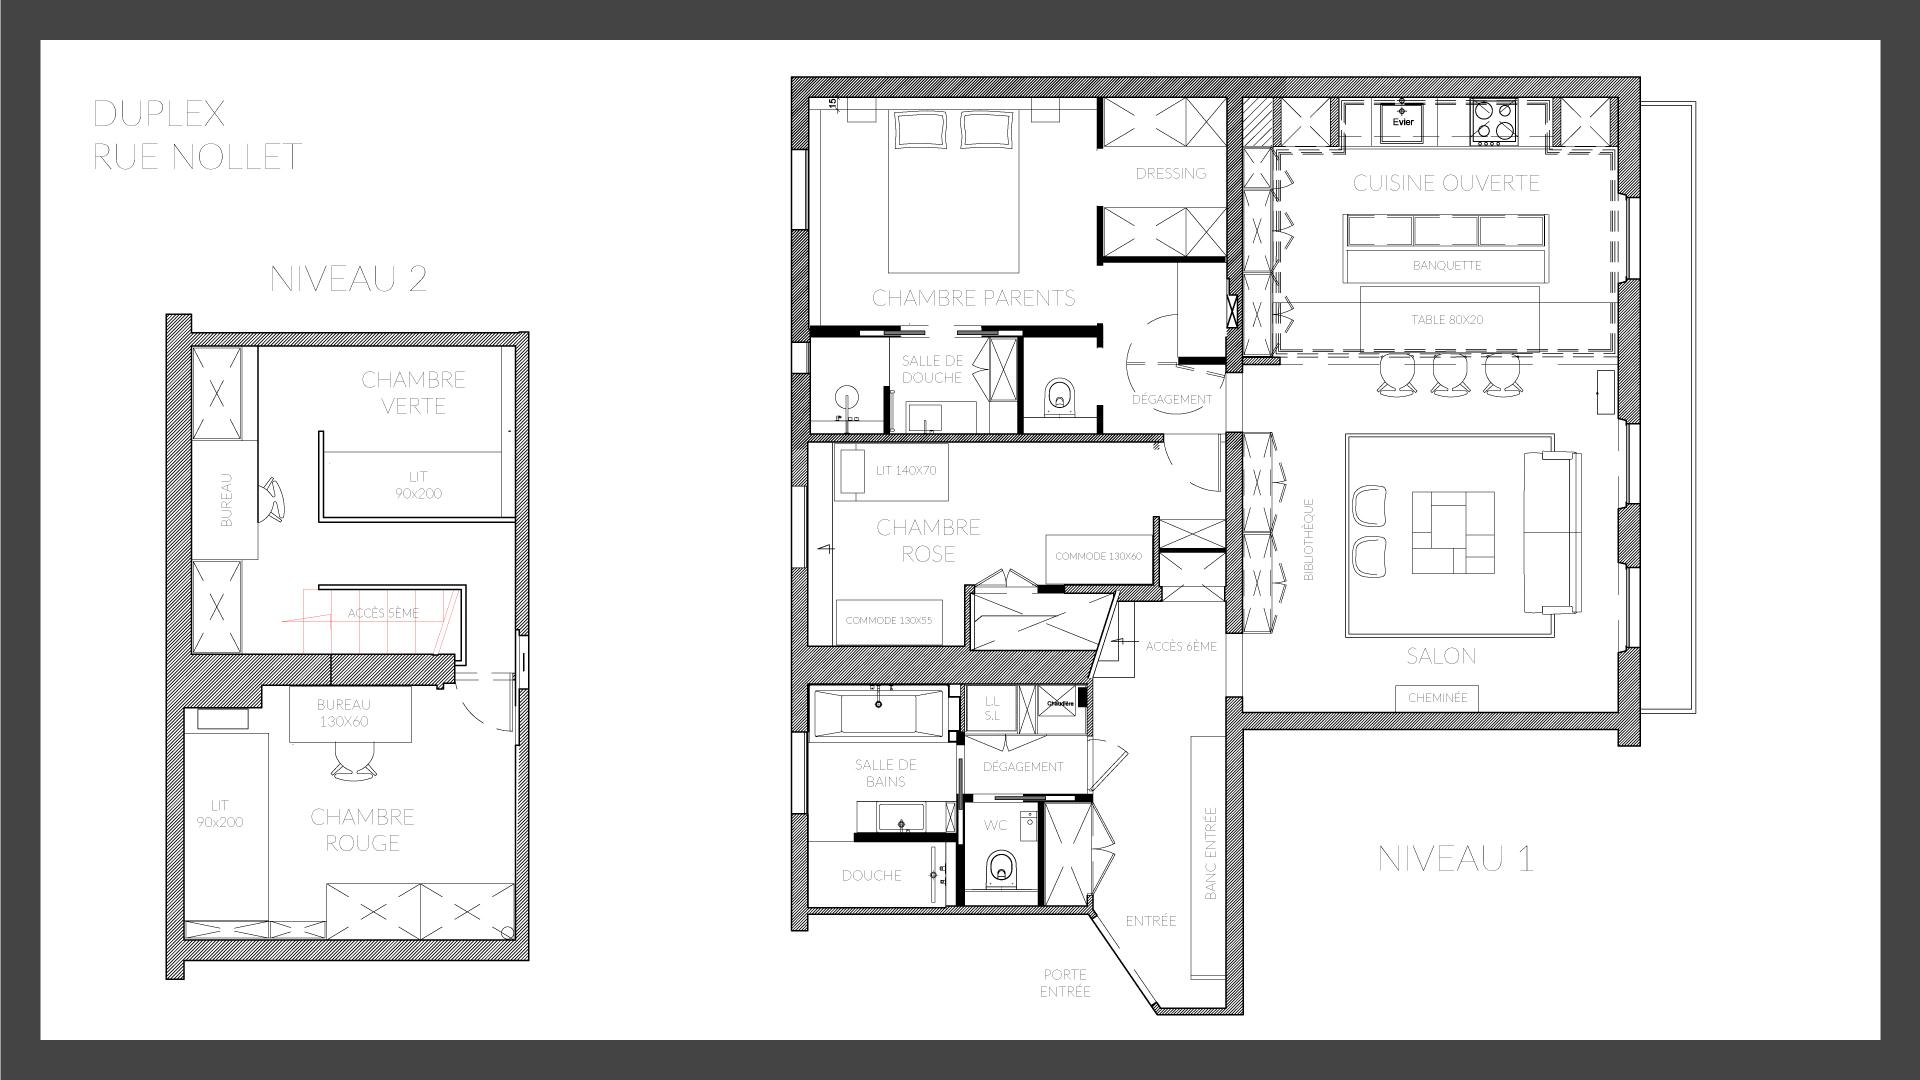 plan-duplex-rue-nollet